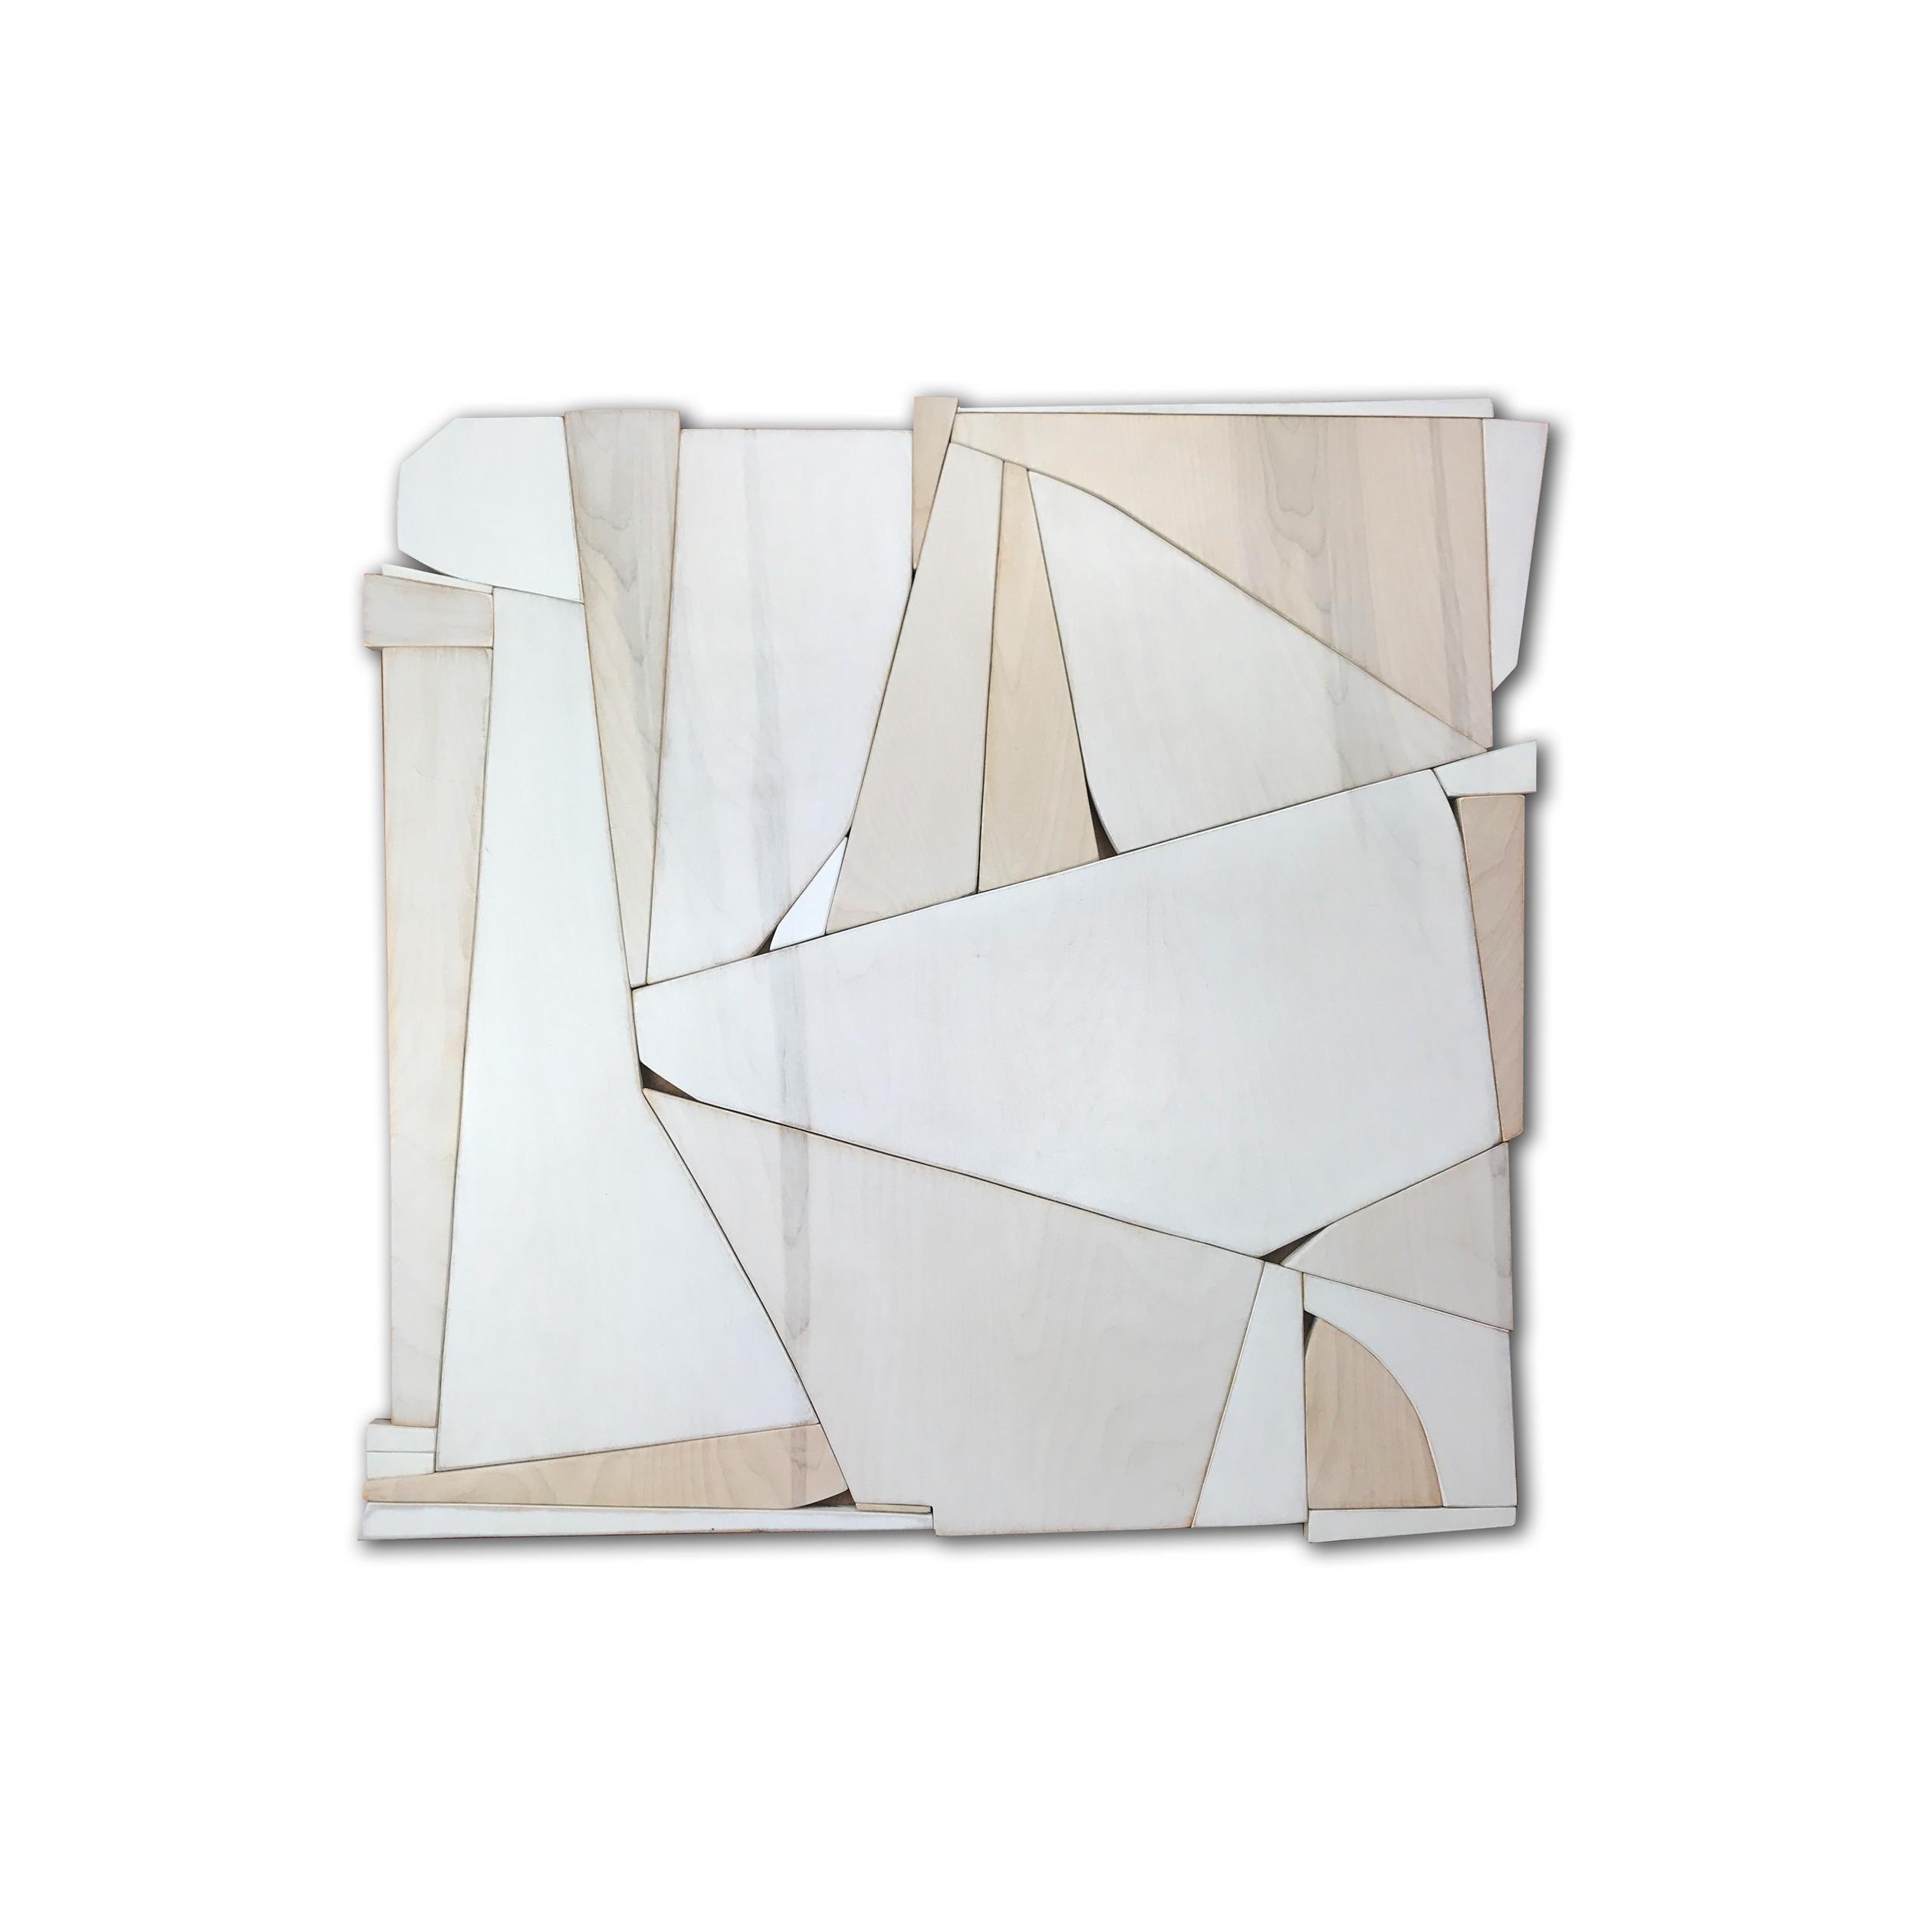 Biscuit I (modern abstract wall sculpture minimal geometric design neutrals art)